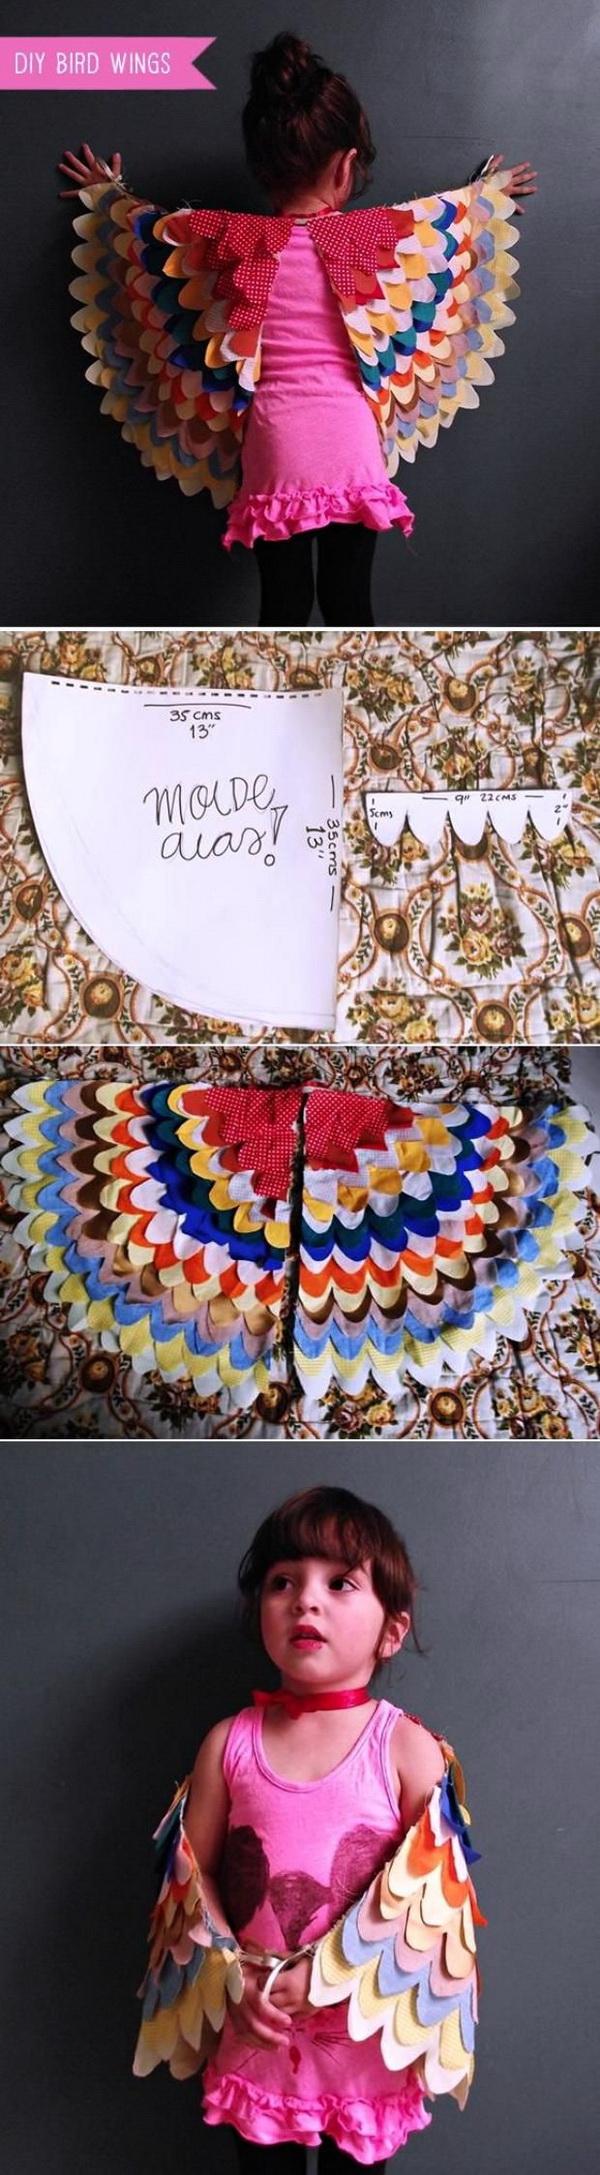 DIY Bird Wings Costume.